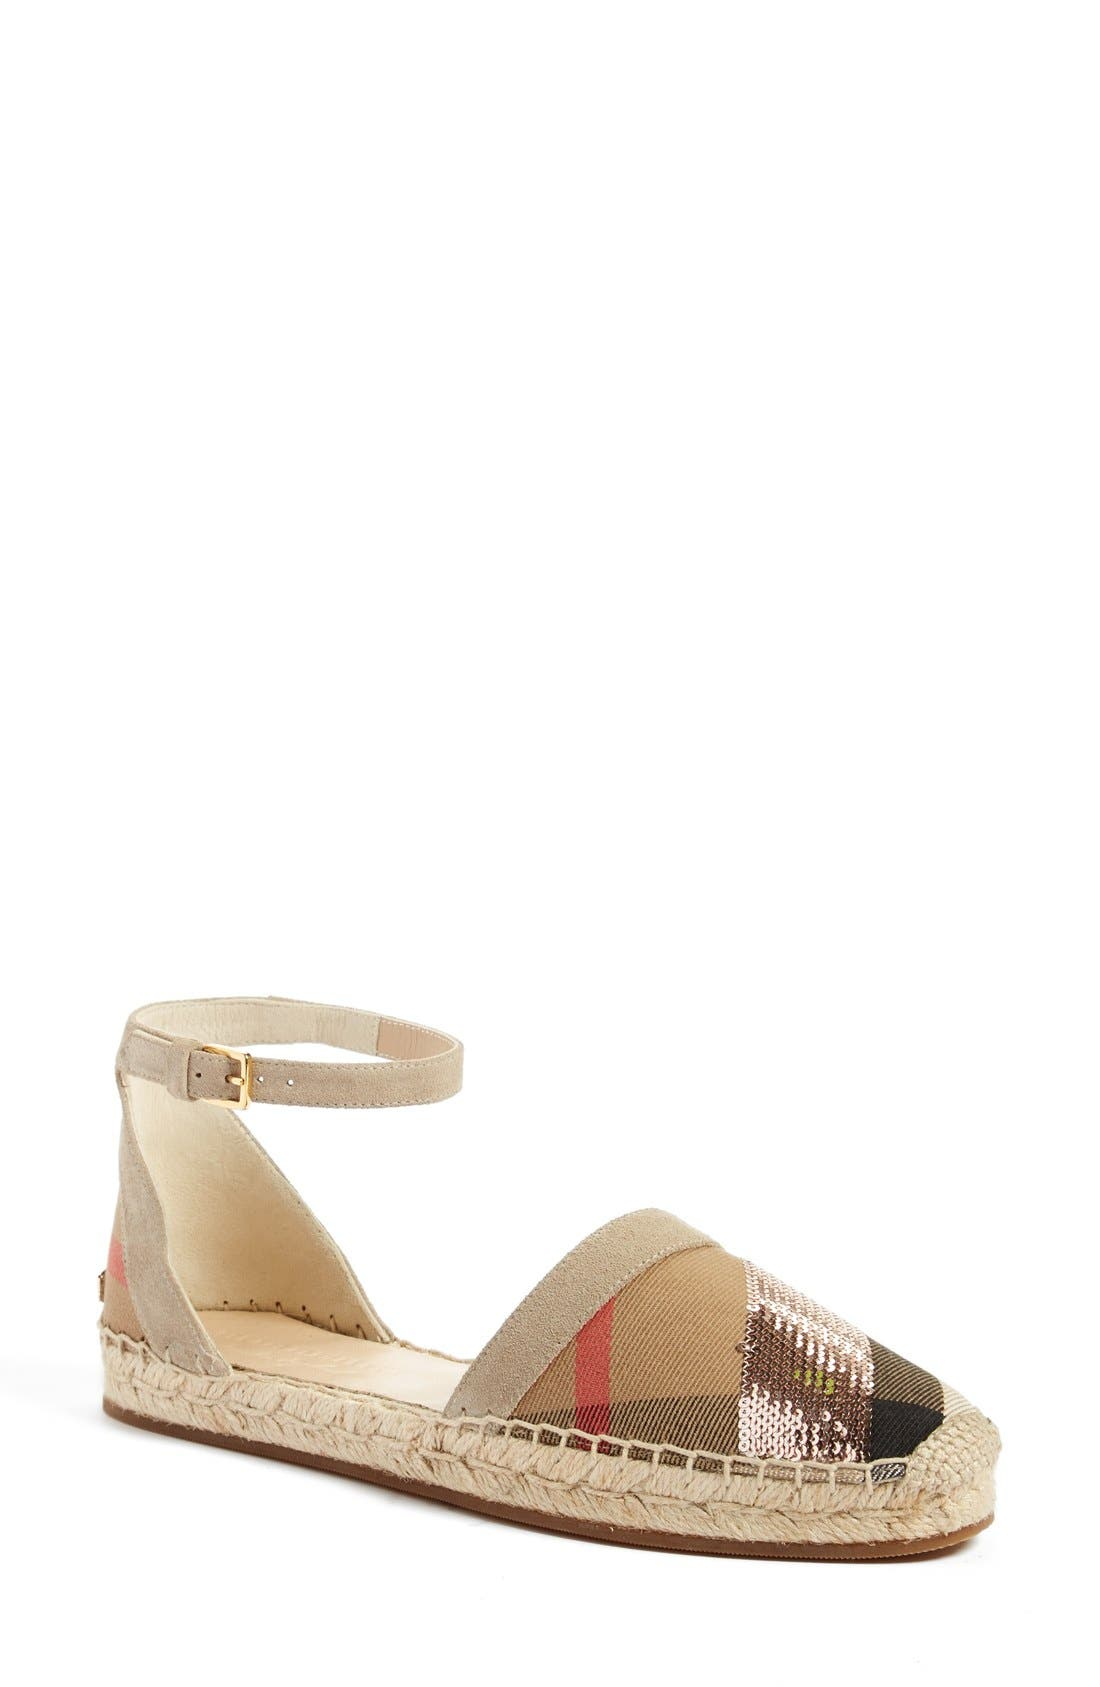 'Abbingdon' Ankle Strap Espadrille Sandal,                             Main thumbnail 1, color,